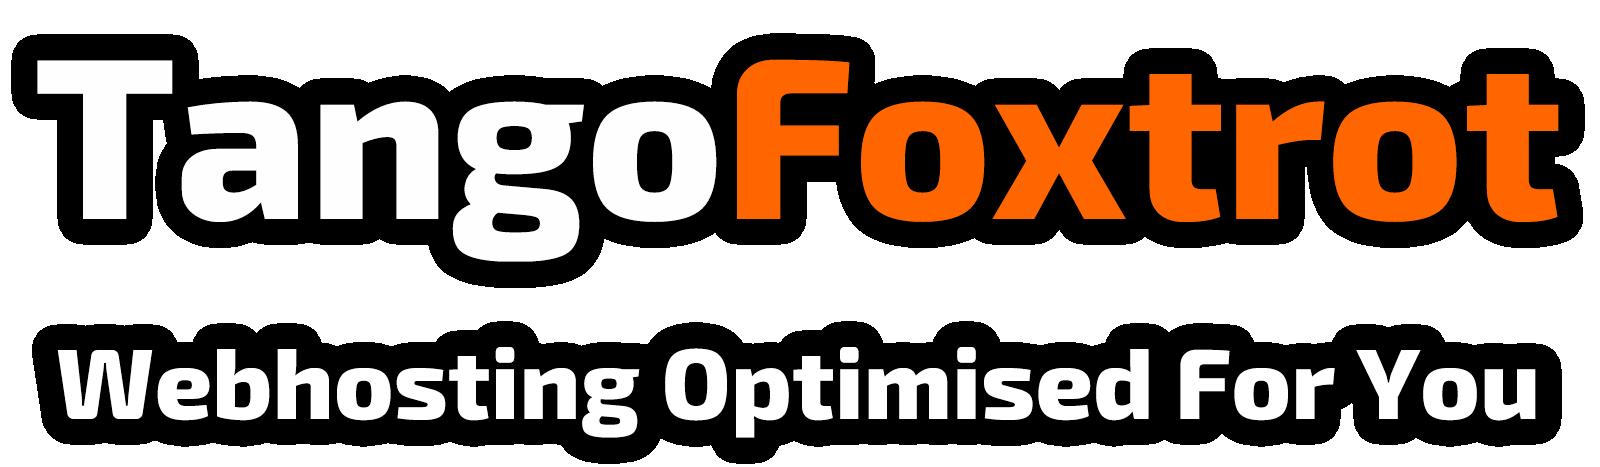 foxtrot promo code